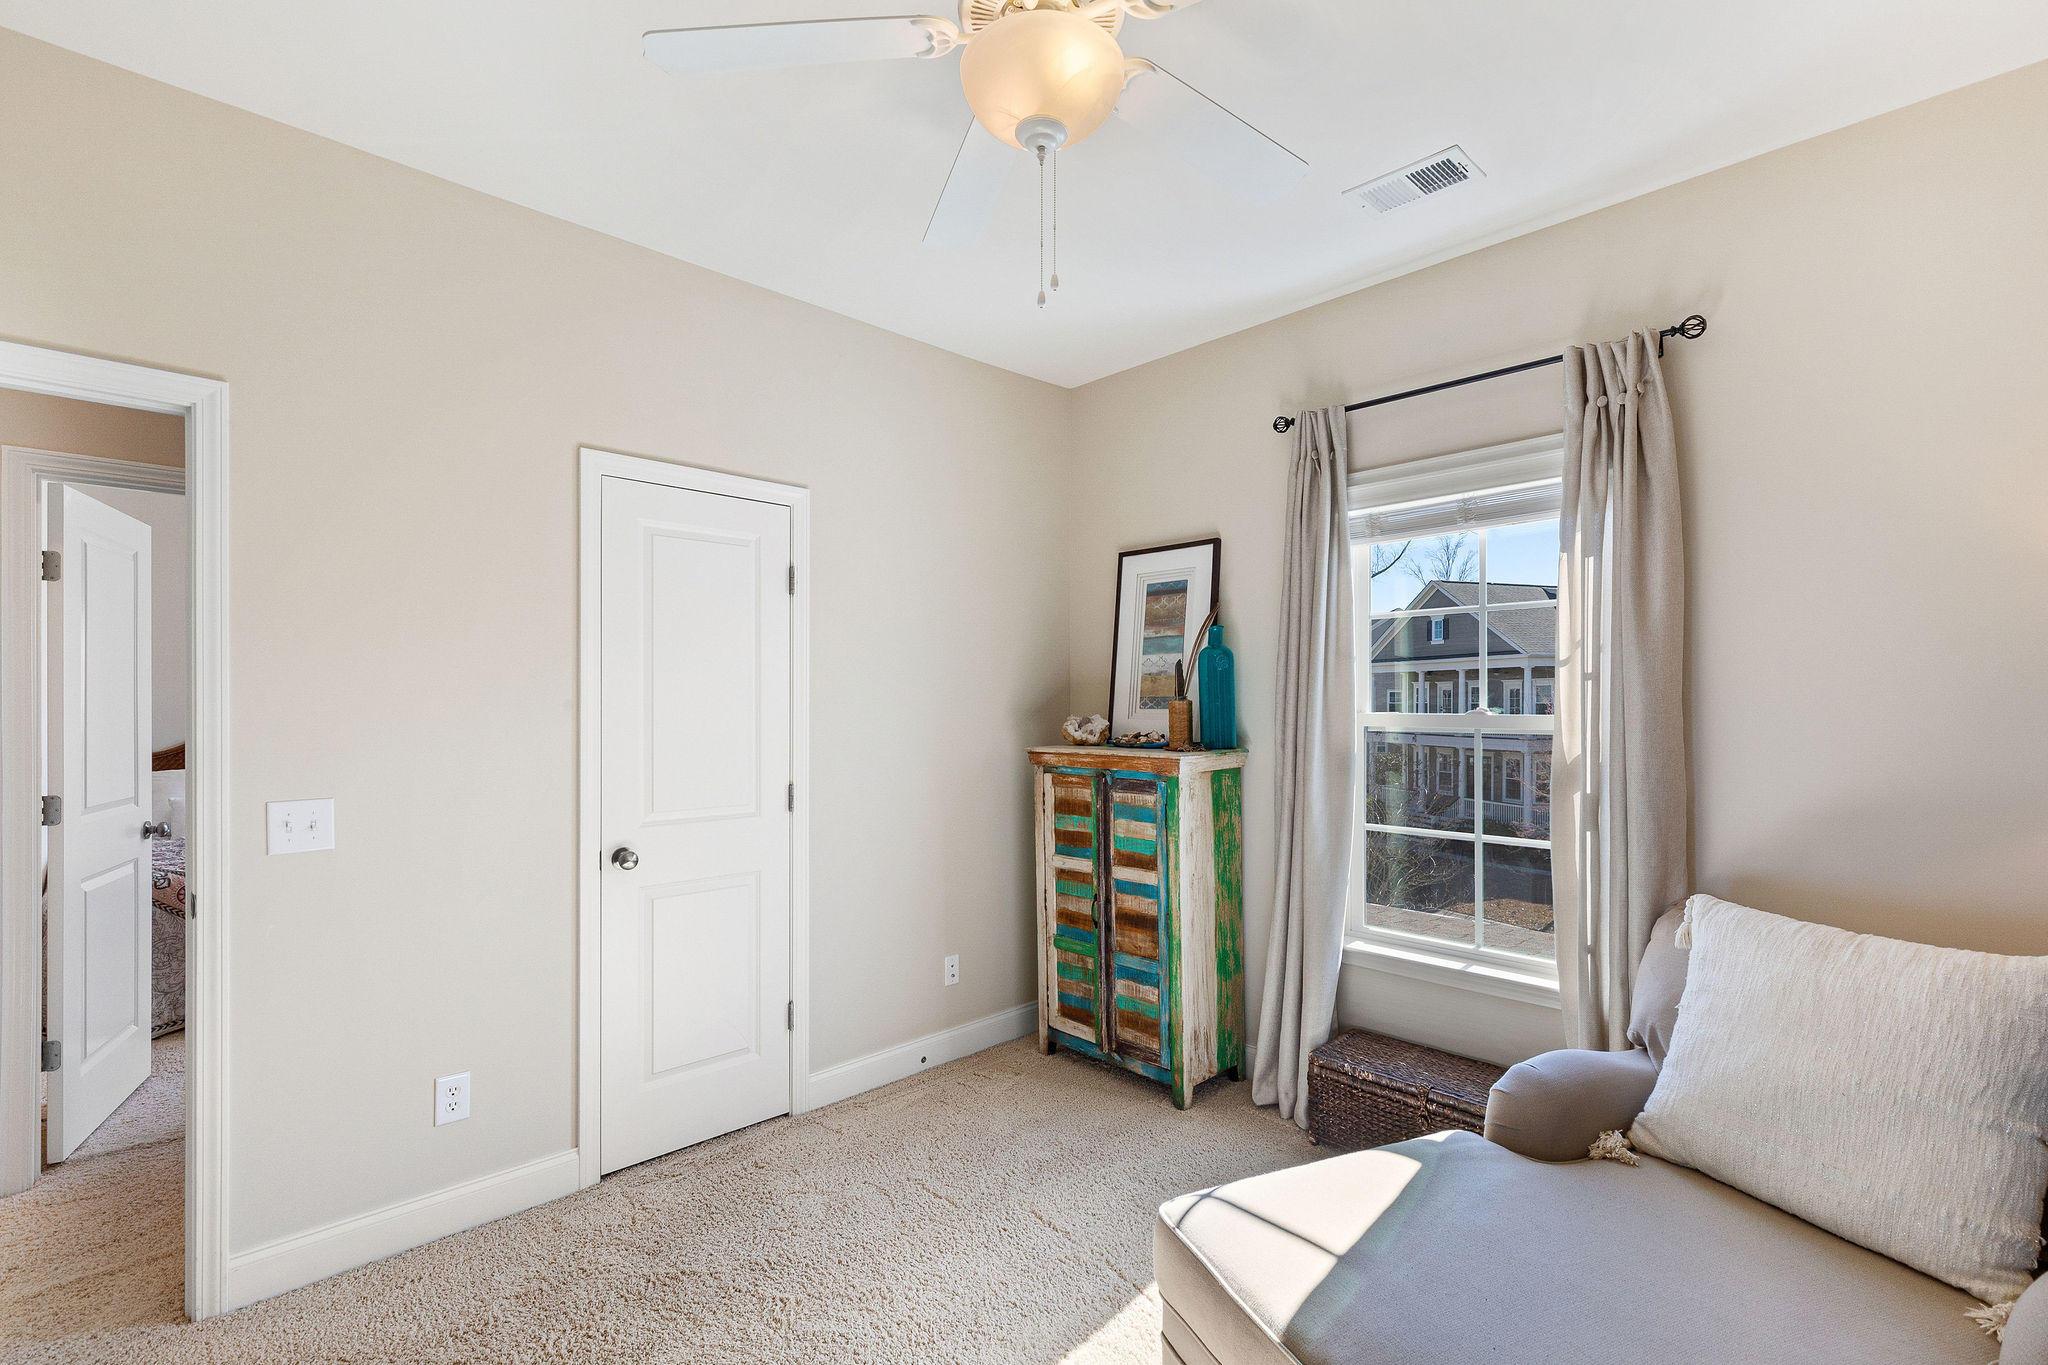 Dunes West Homes For Sale - 3212 Hatchway, Mount Pleasant, SC - 56